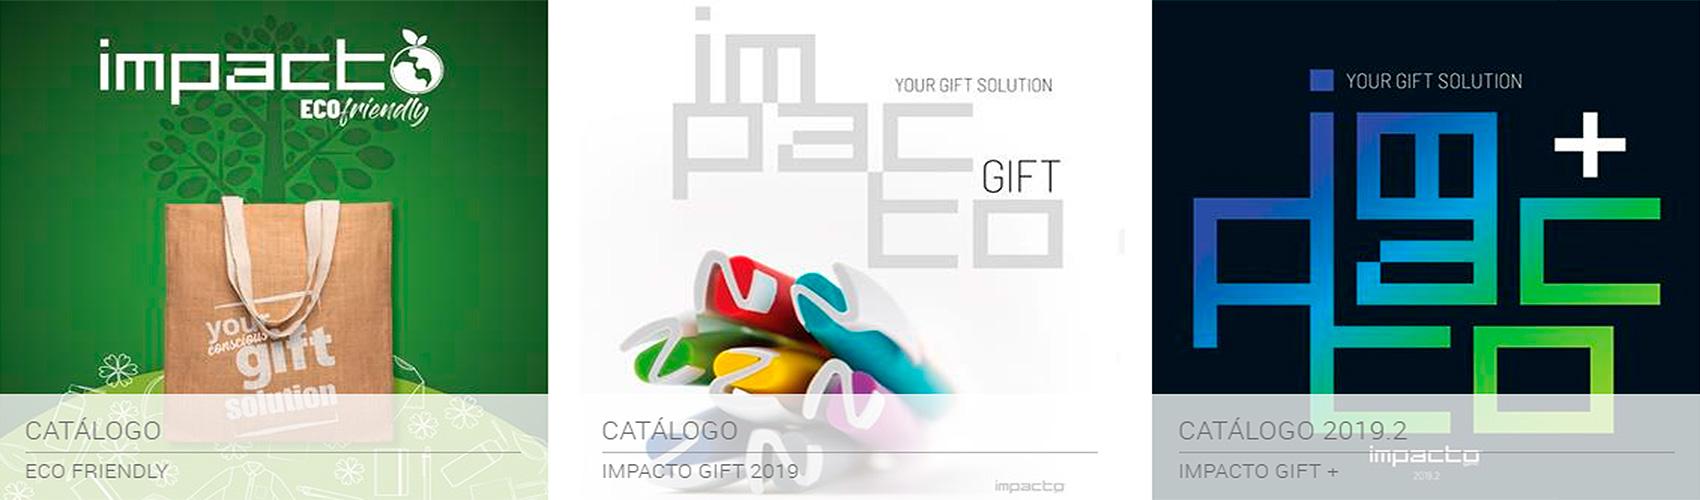 Impacto catálogo promocional